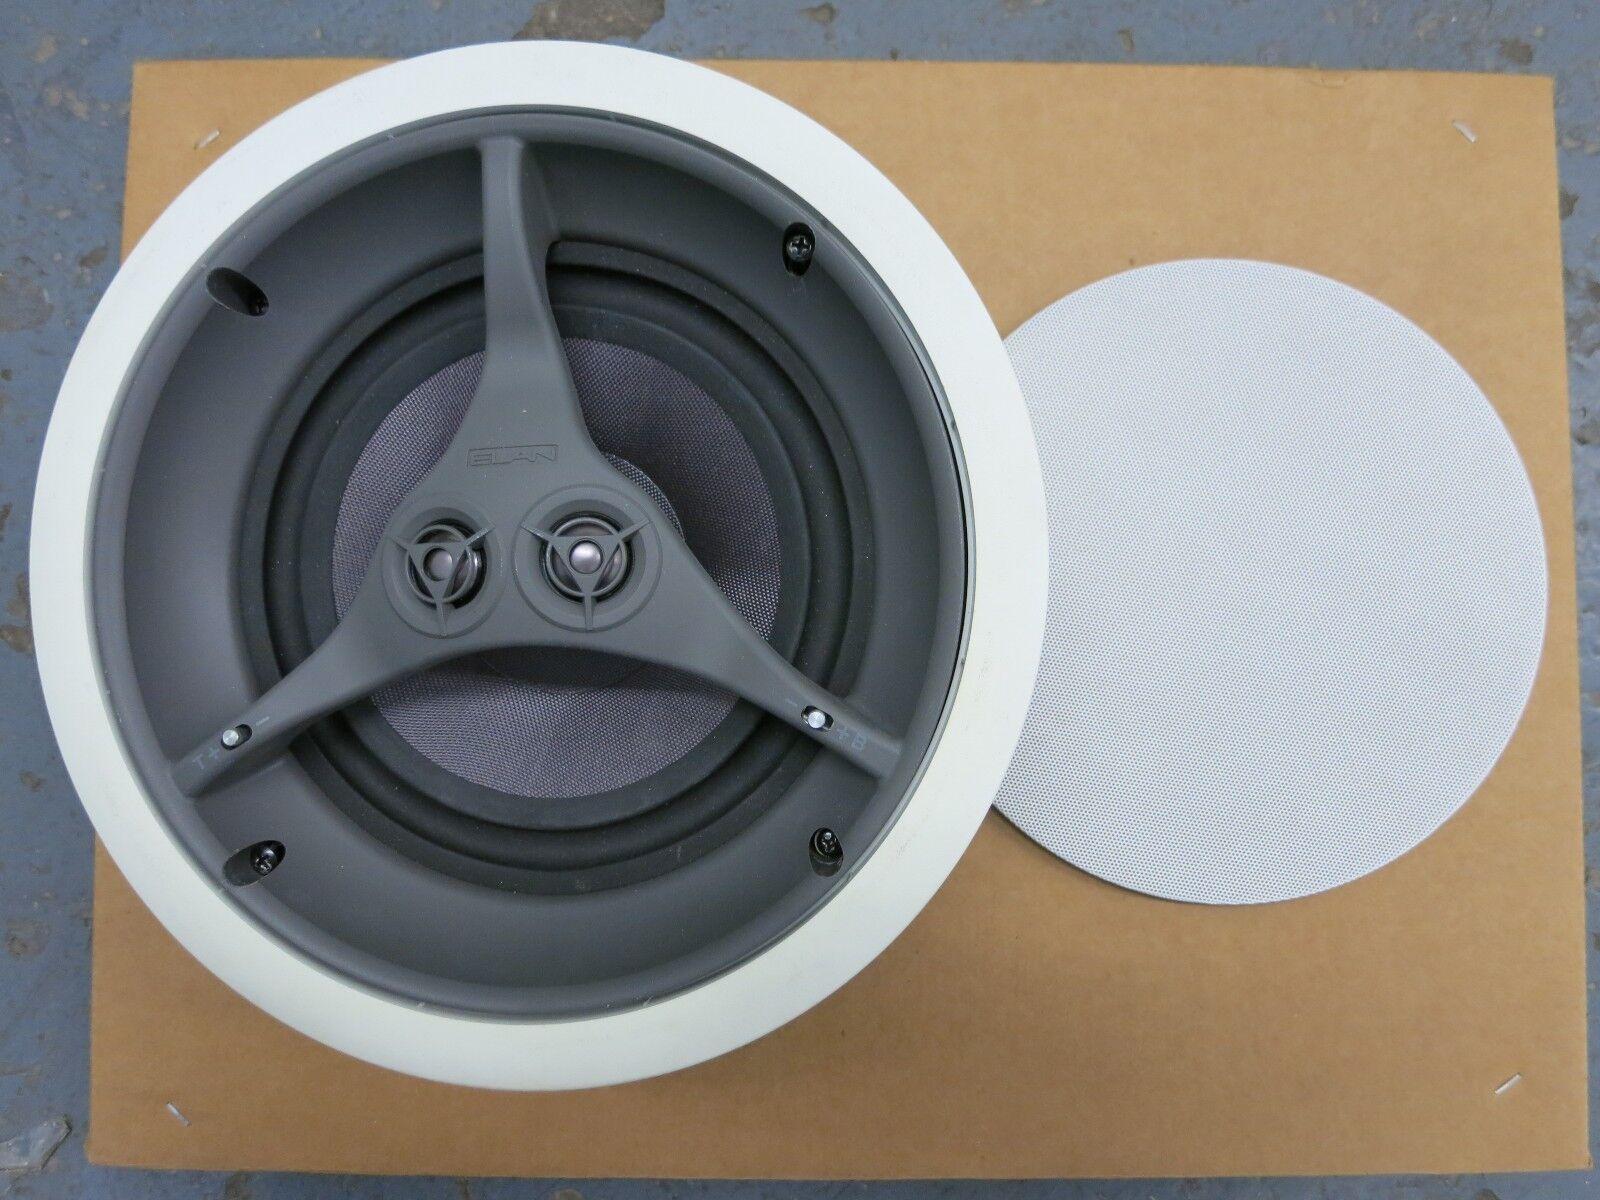 Elan MP800D Premium Channel Speaker In Wall In Ceiling - AS IS